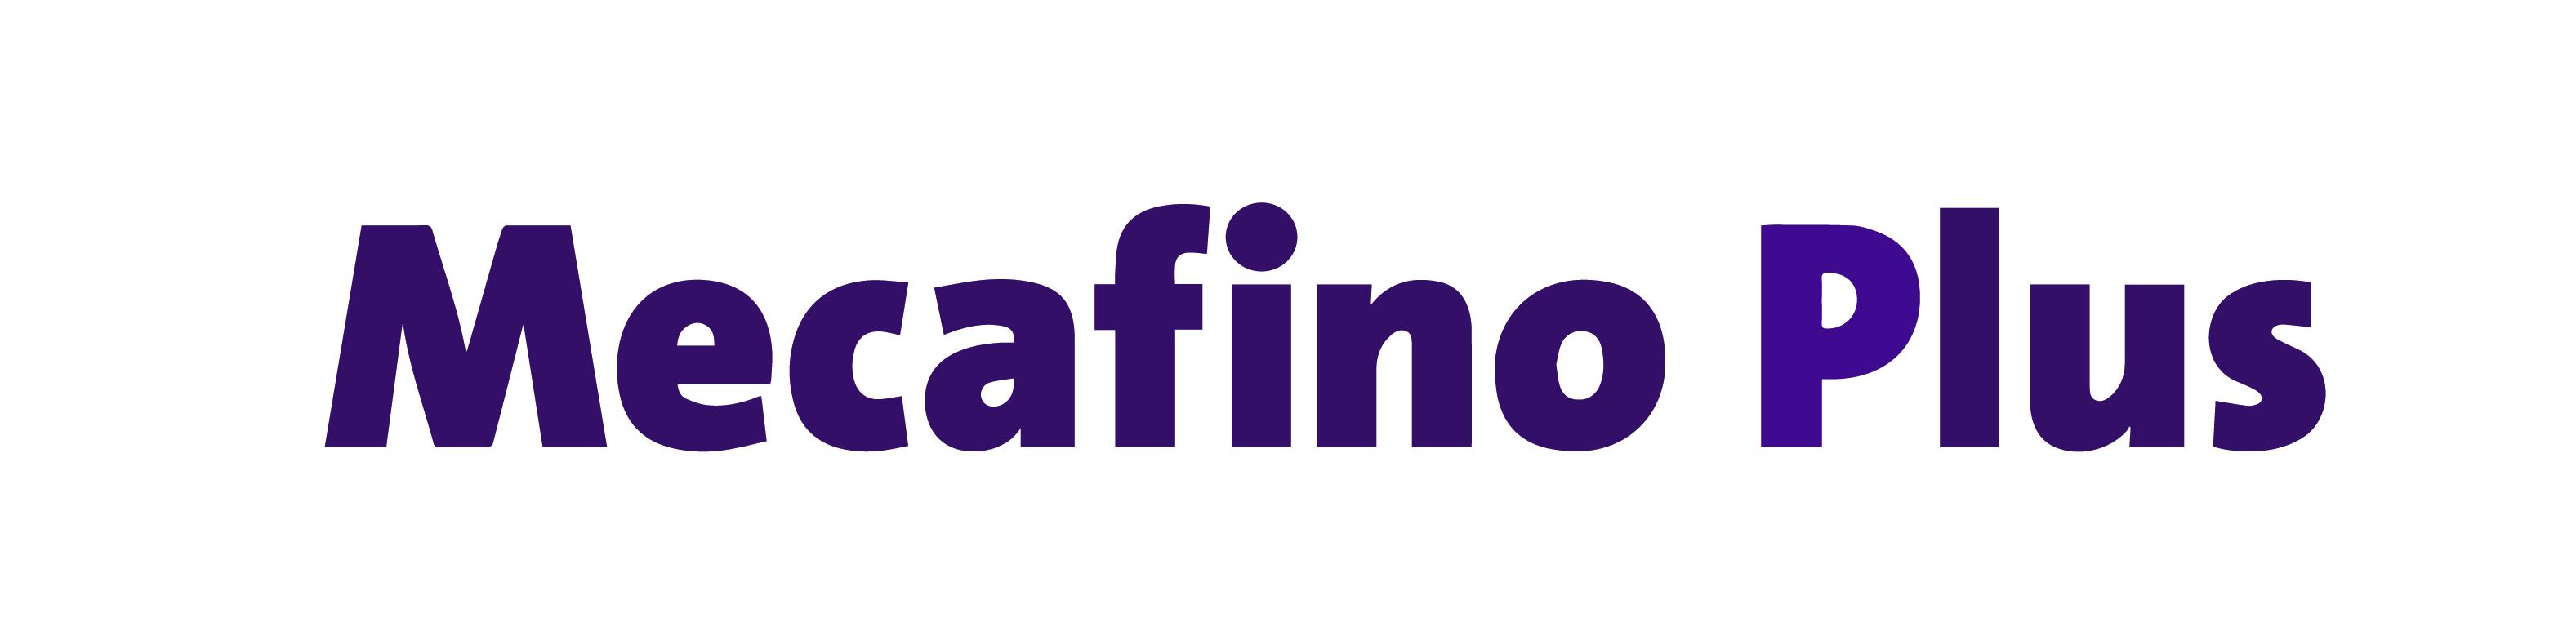 logotipo yeso mecafino plus terminaciones